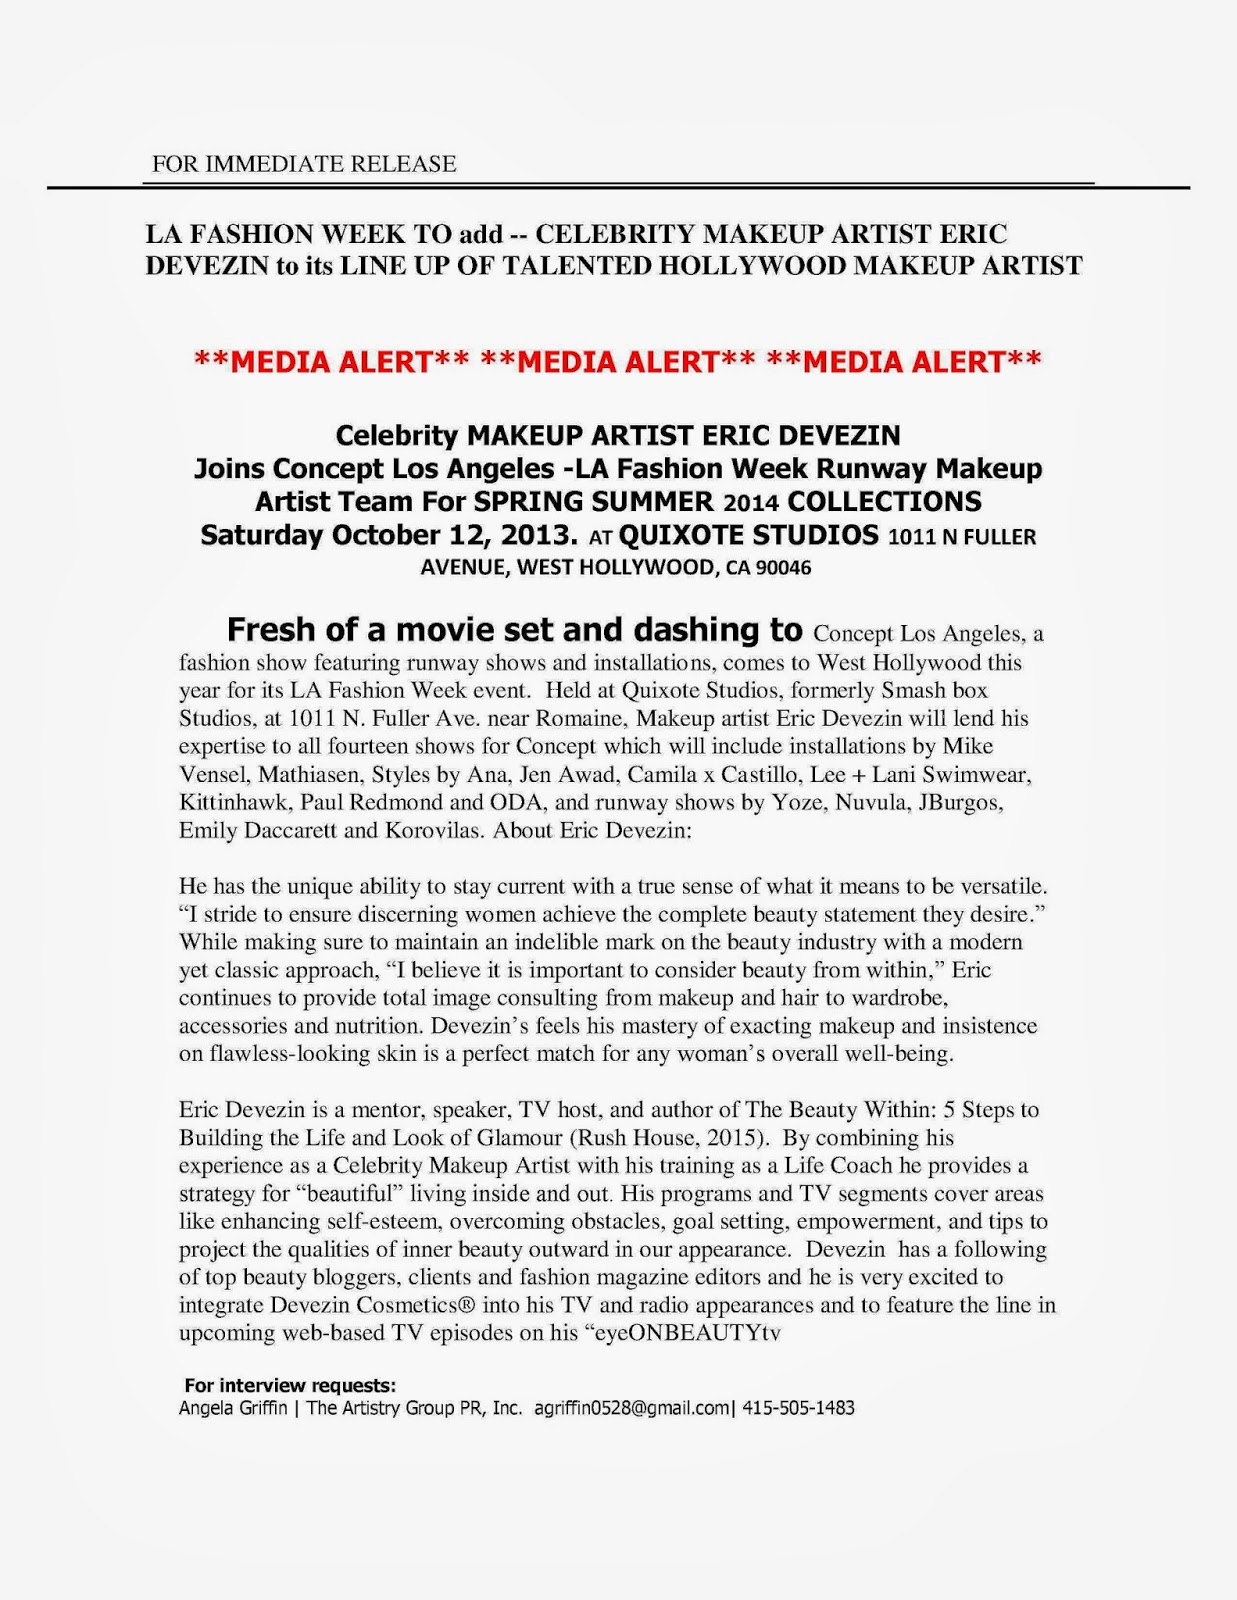 Latest Celebrities News & Press Release - Free Celebrities ...